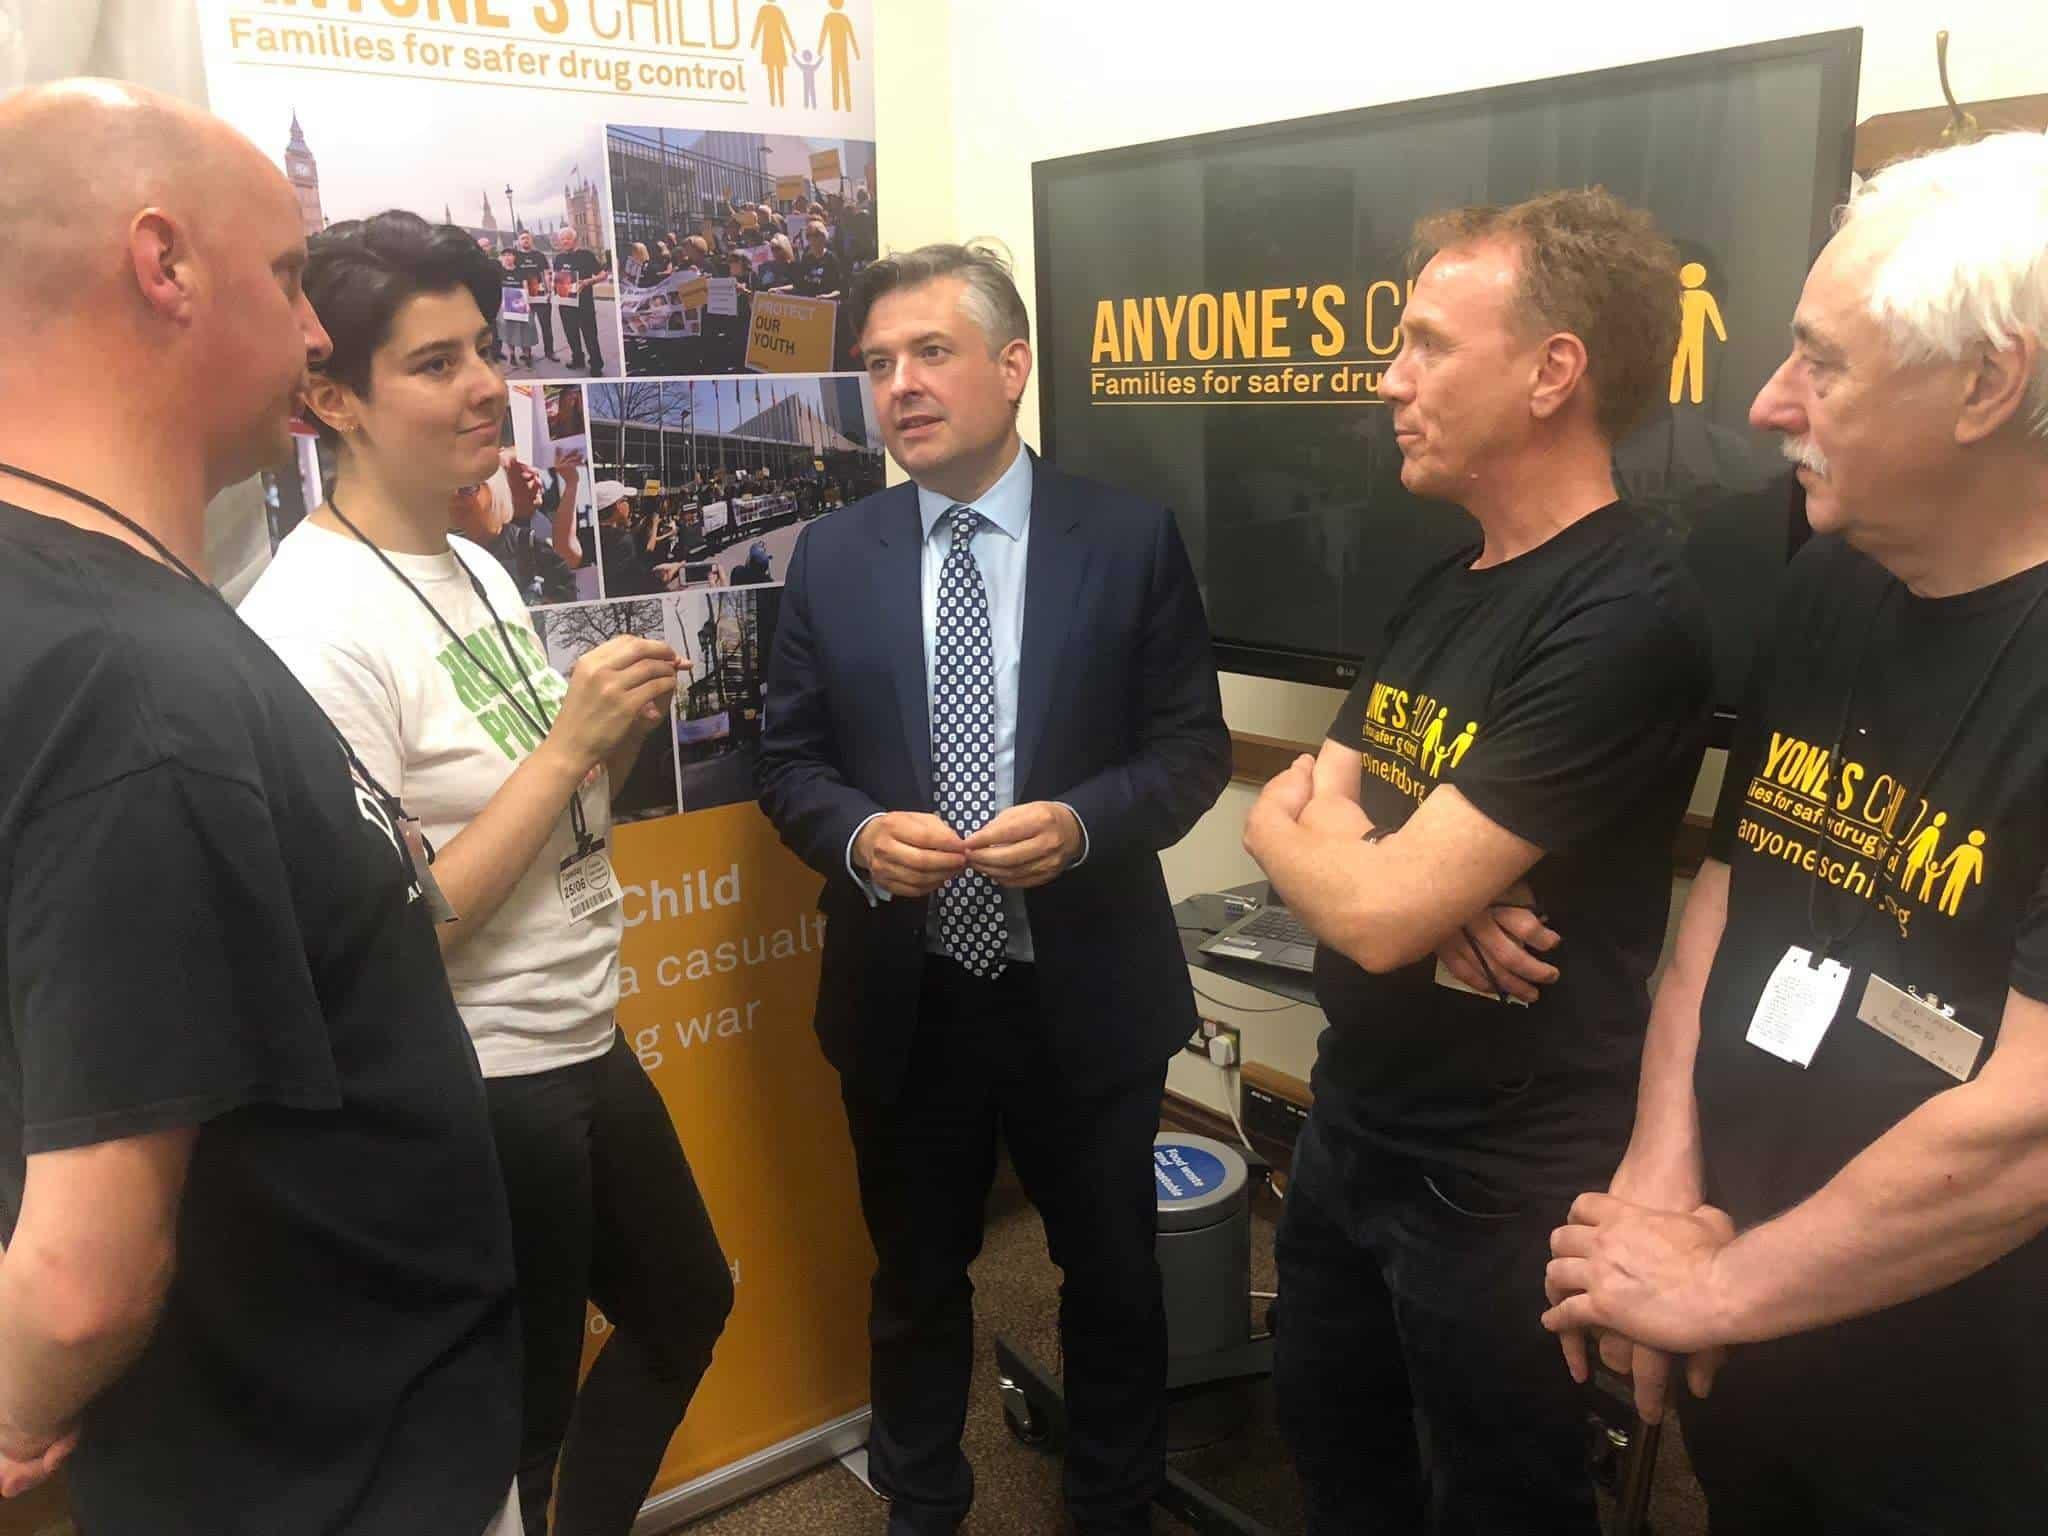 Jon Ashworth MP Anyone's Child lobby